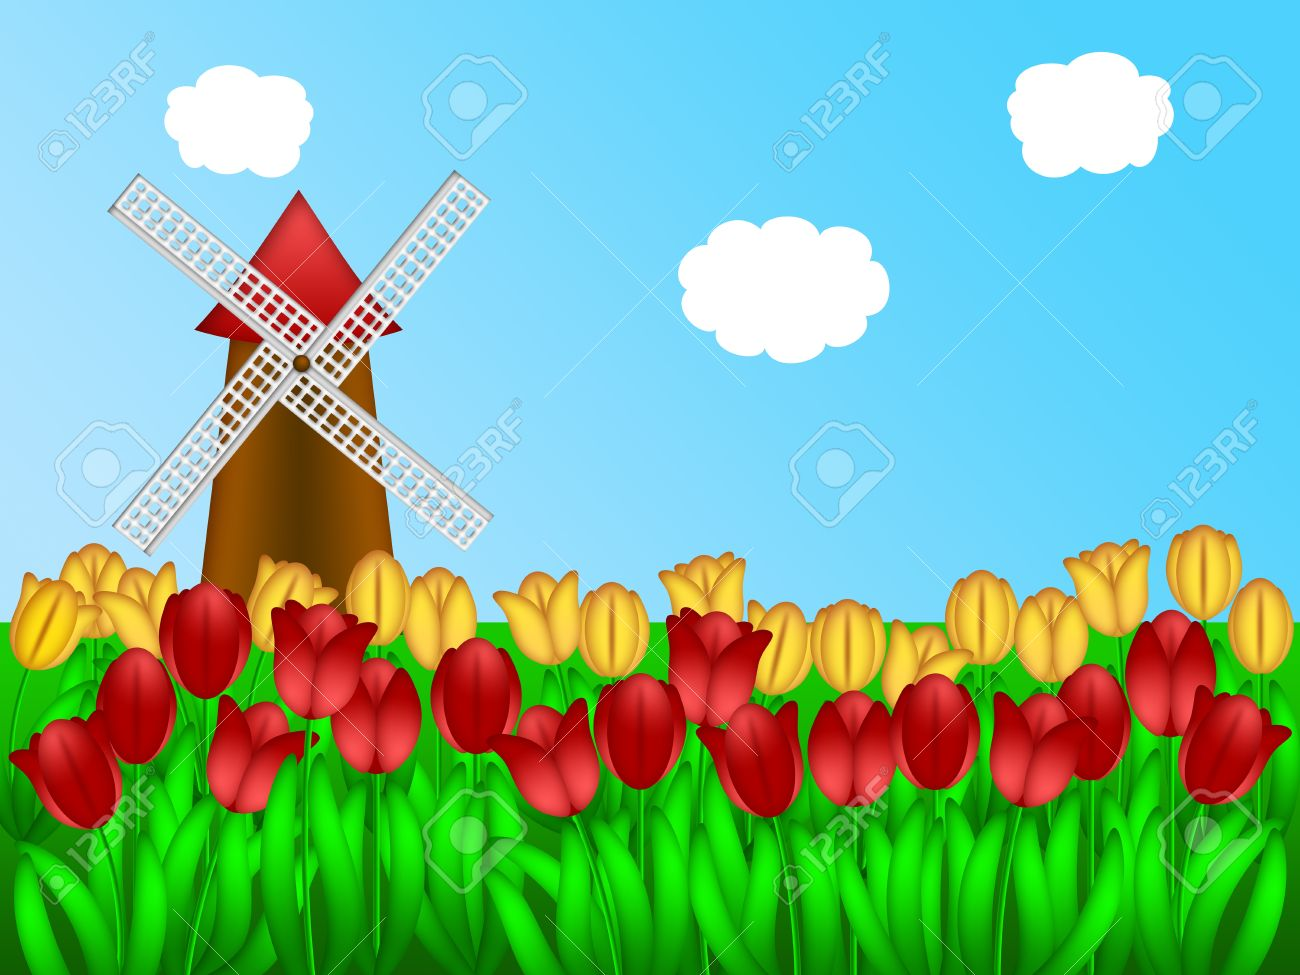 Dutch Windmill In Holland Tulips Field Farm Illustration Stock.